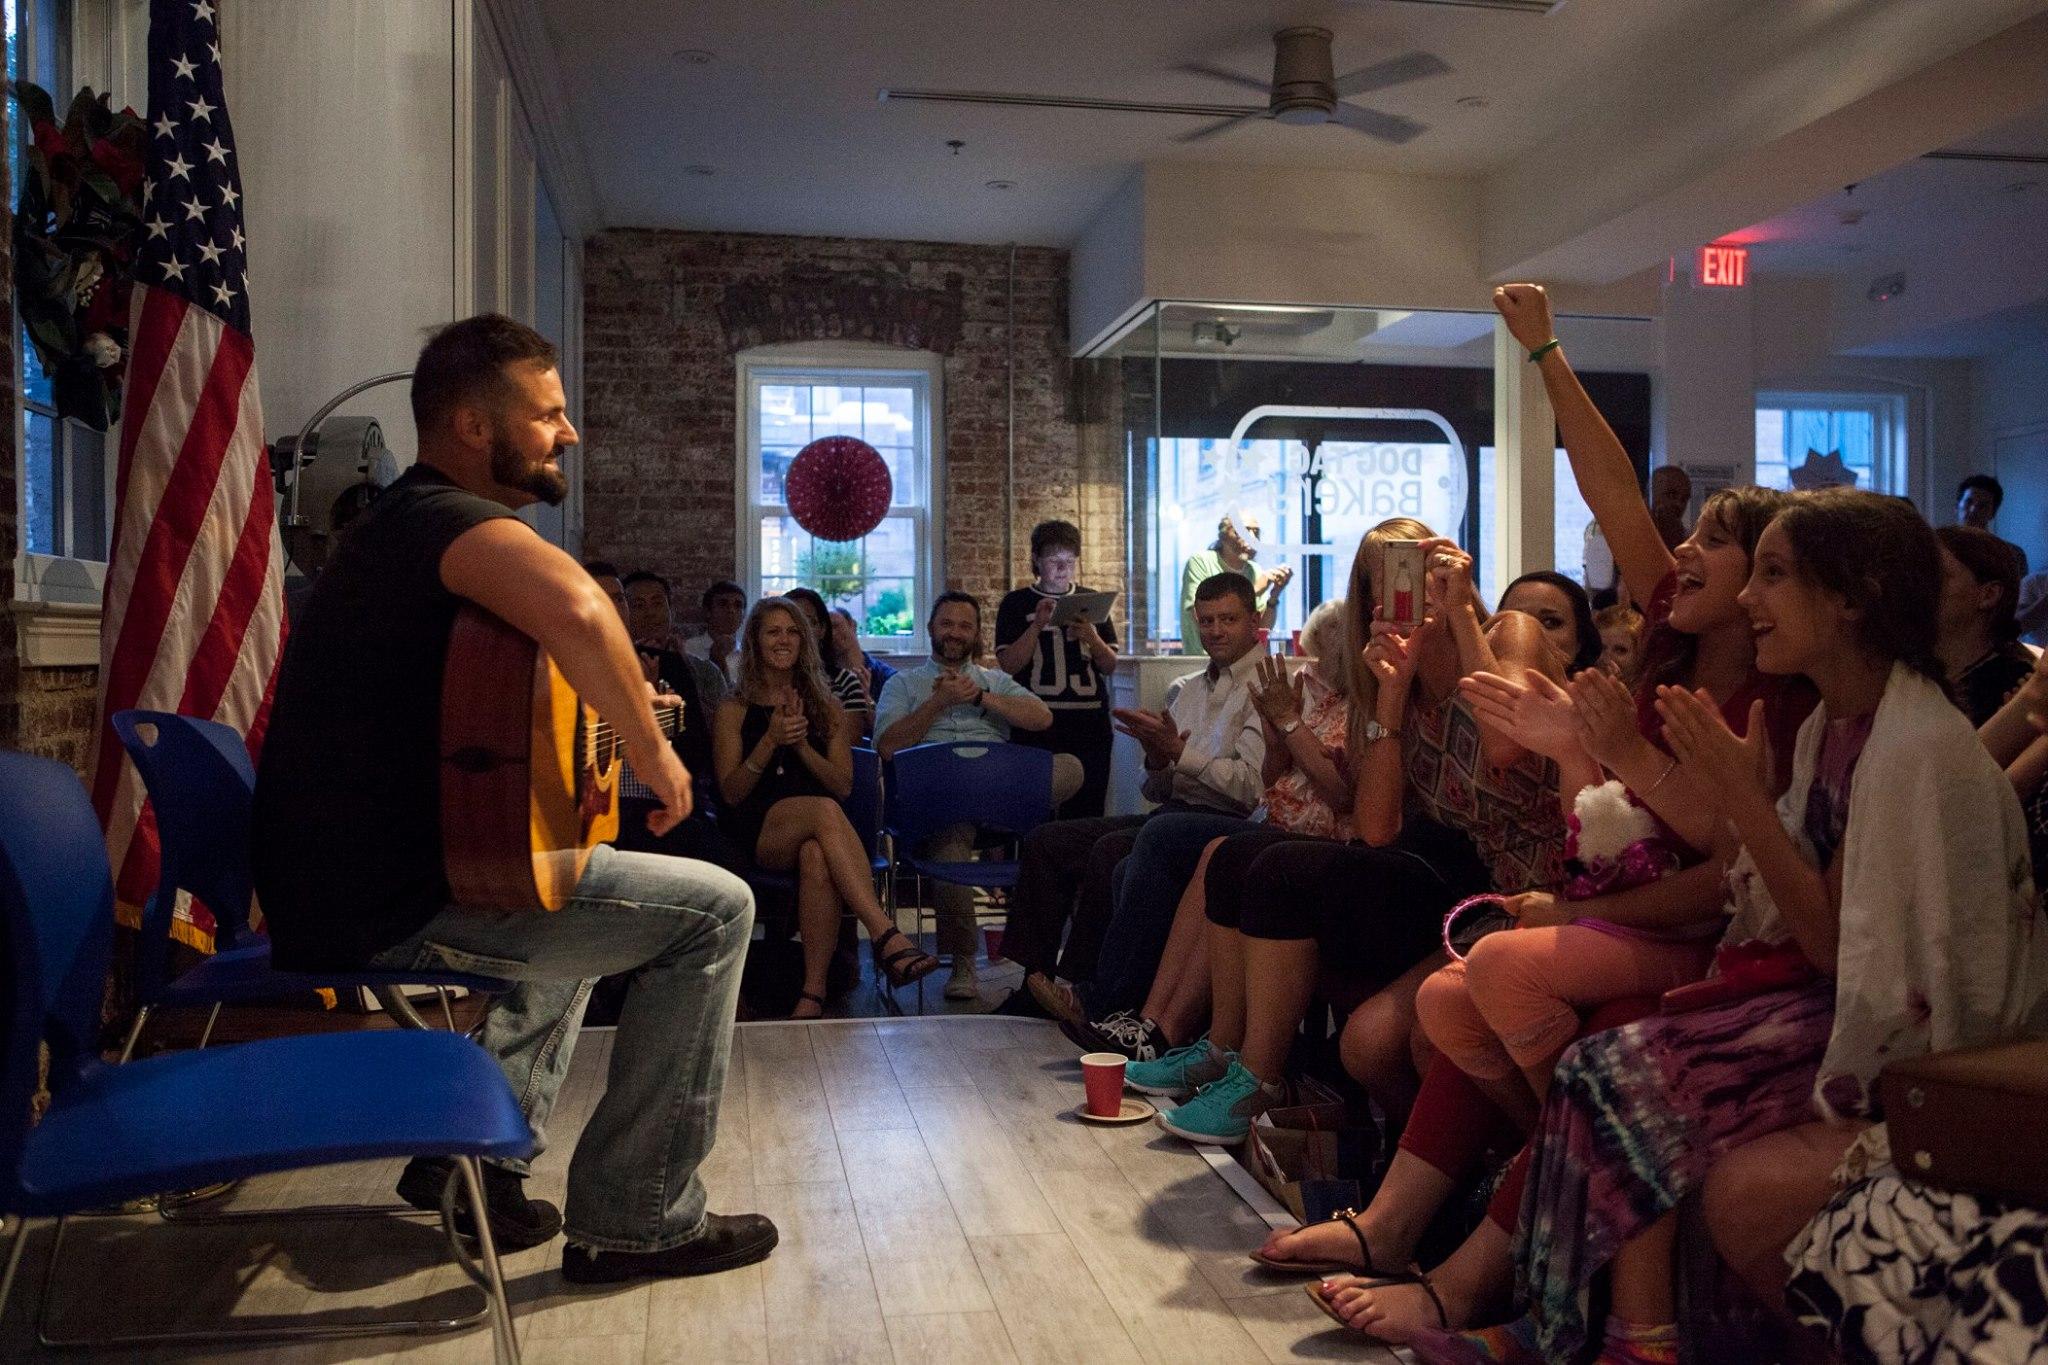 EJ Delpero performs at a Veterans Open Mic in Washington, D.C.